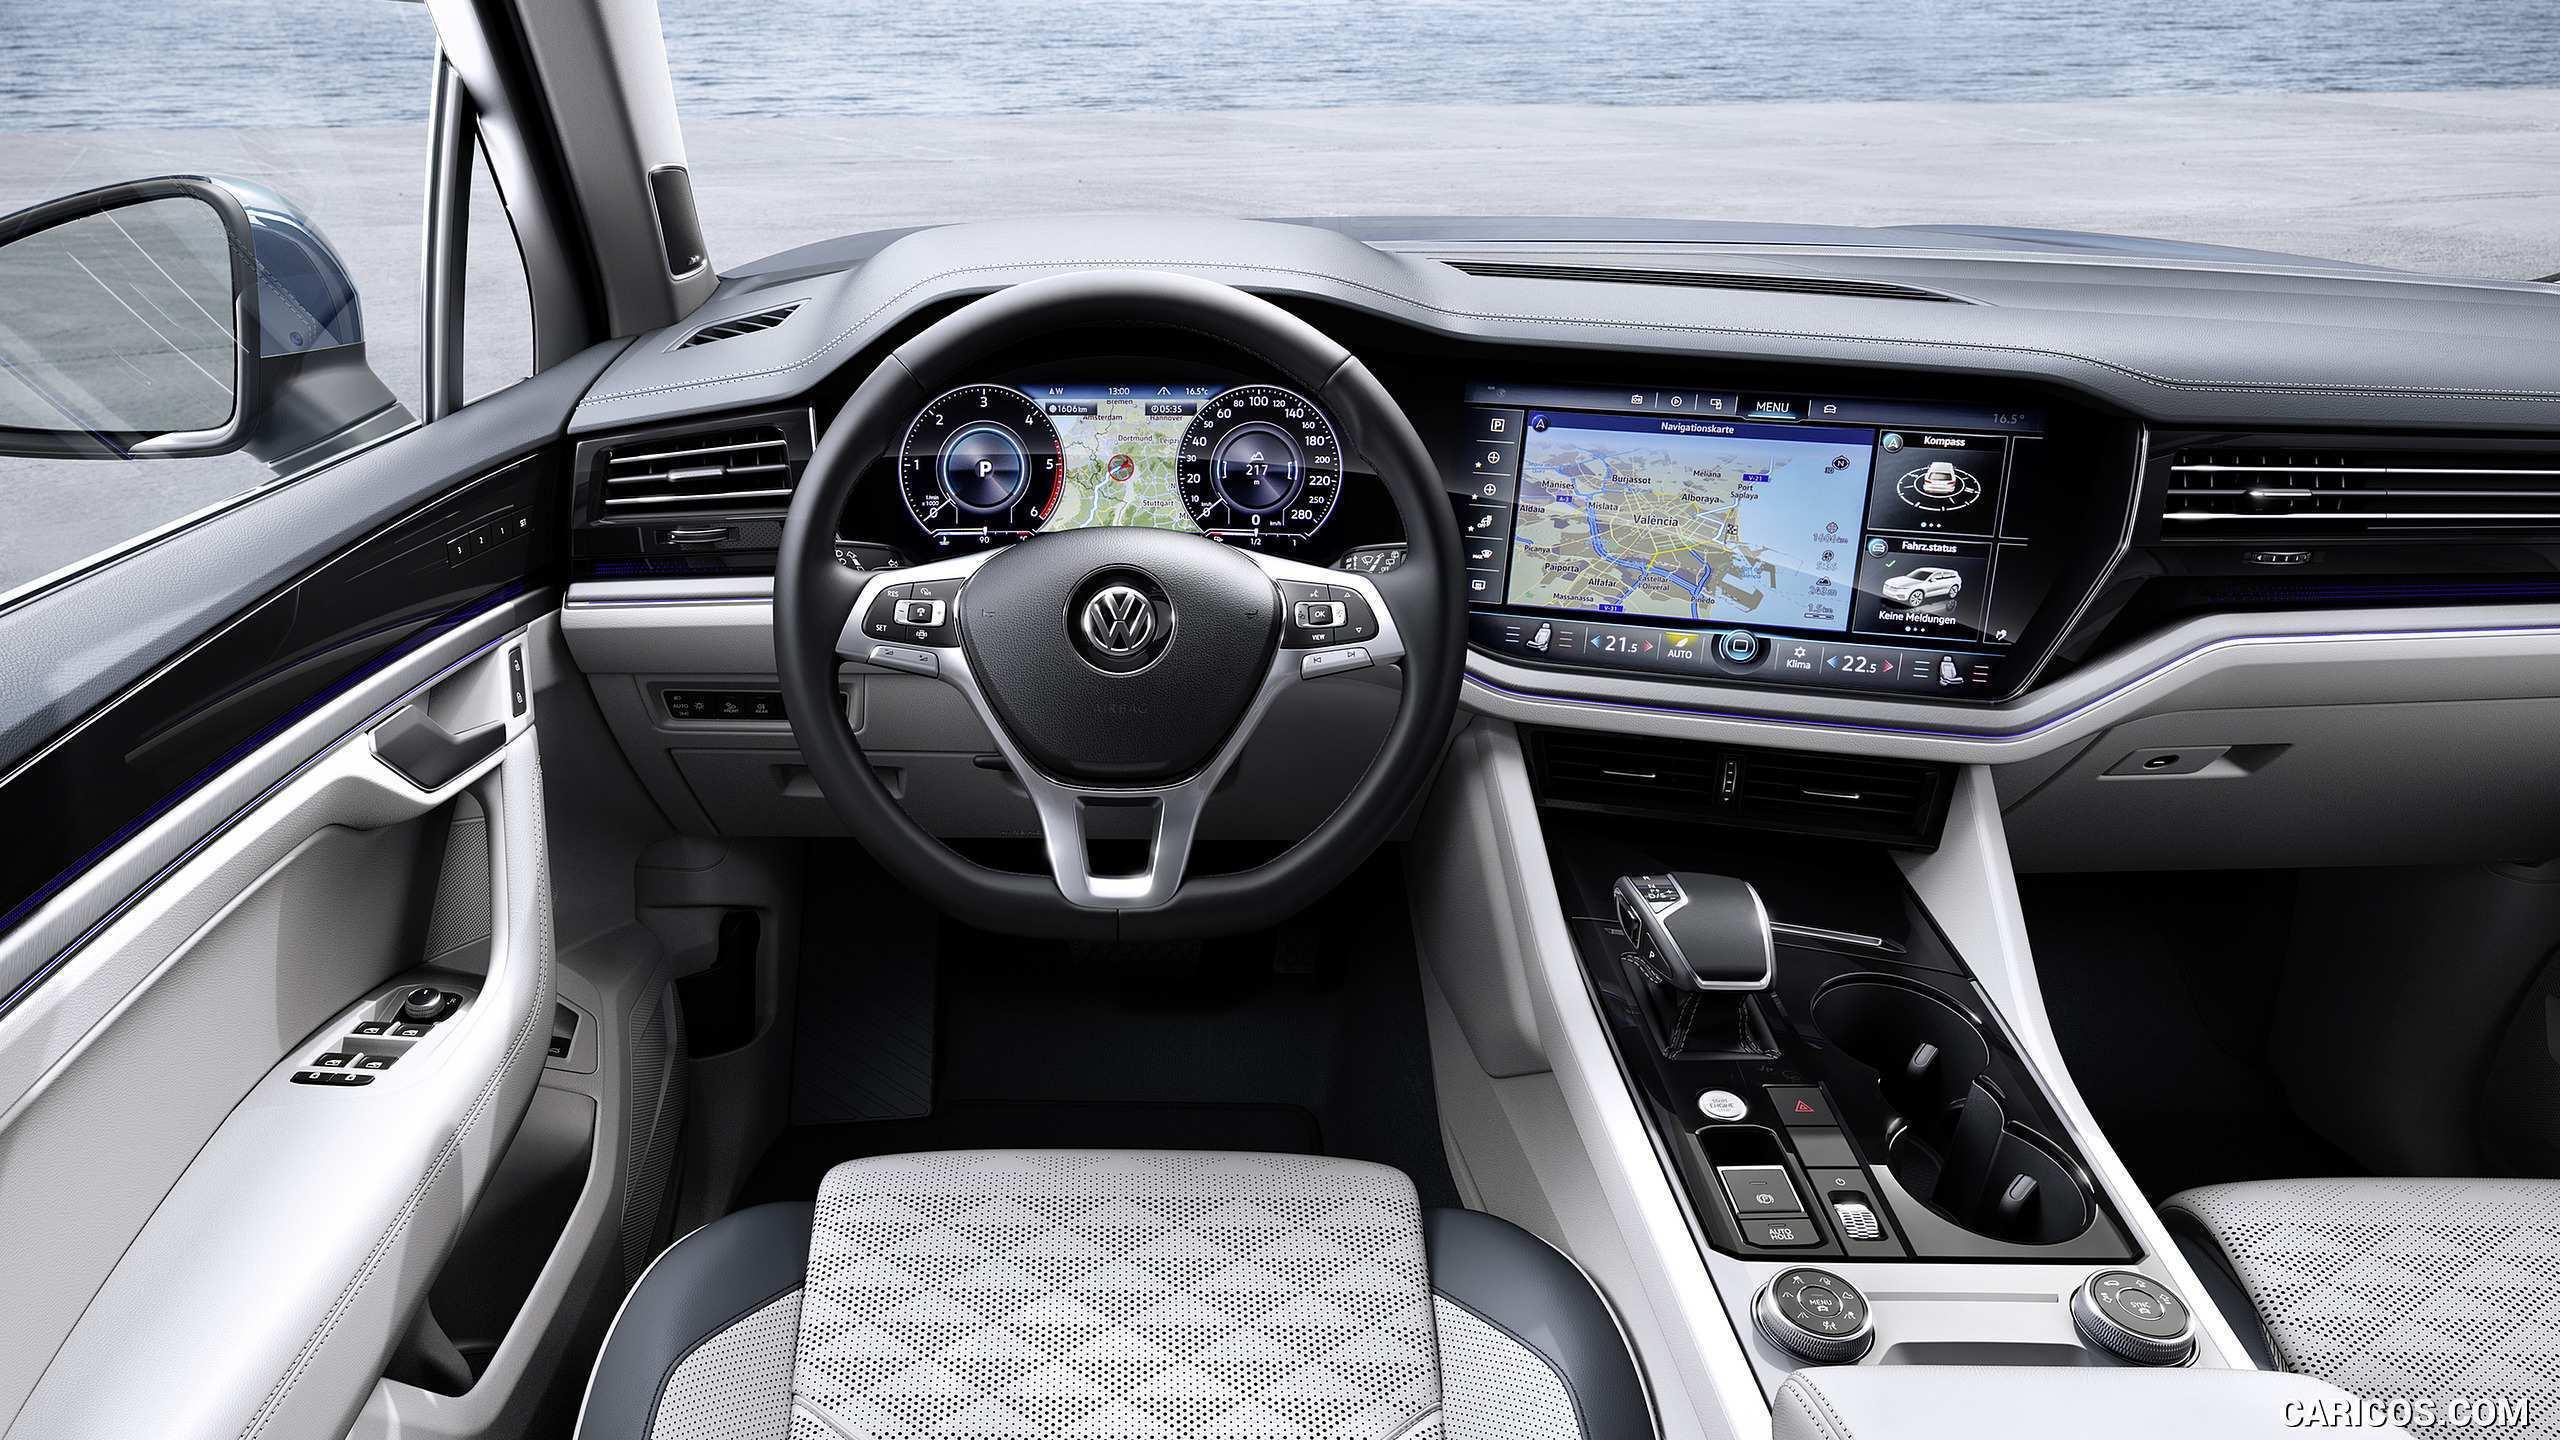 43 All New 2019 Volkswagen Touareg Interior Speed Test by 2019 Volkswagen Touareg Interior